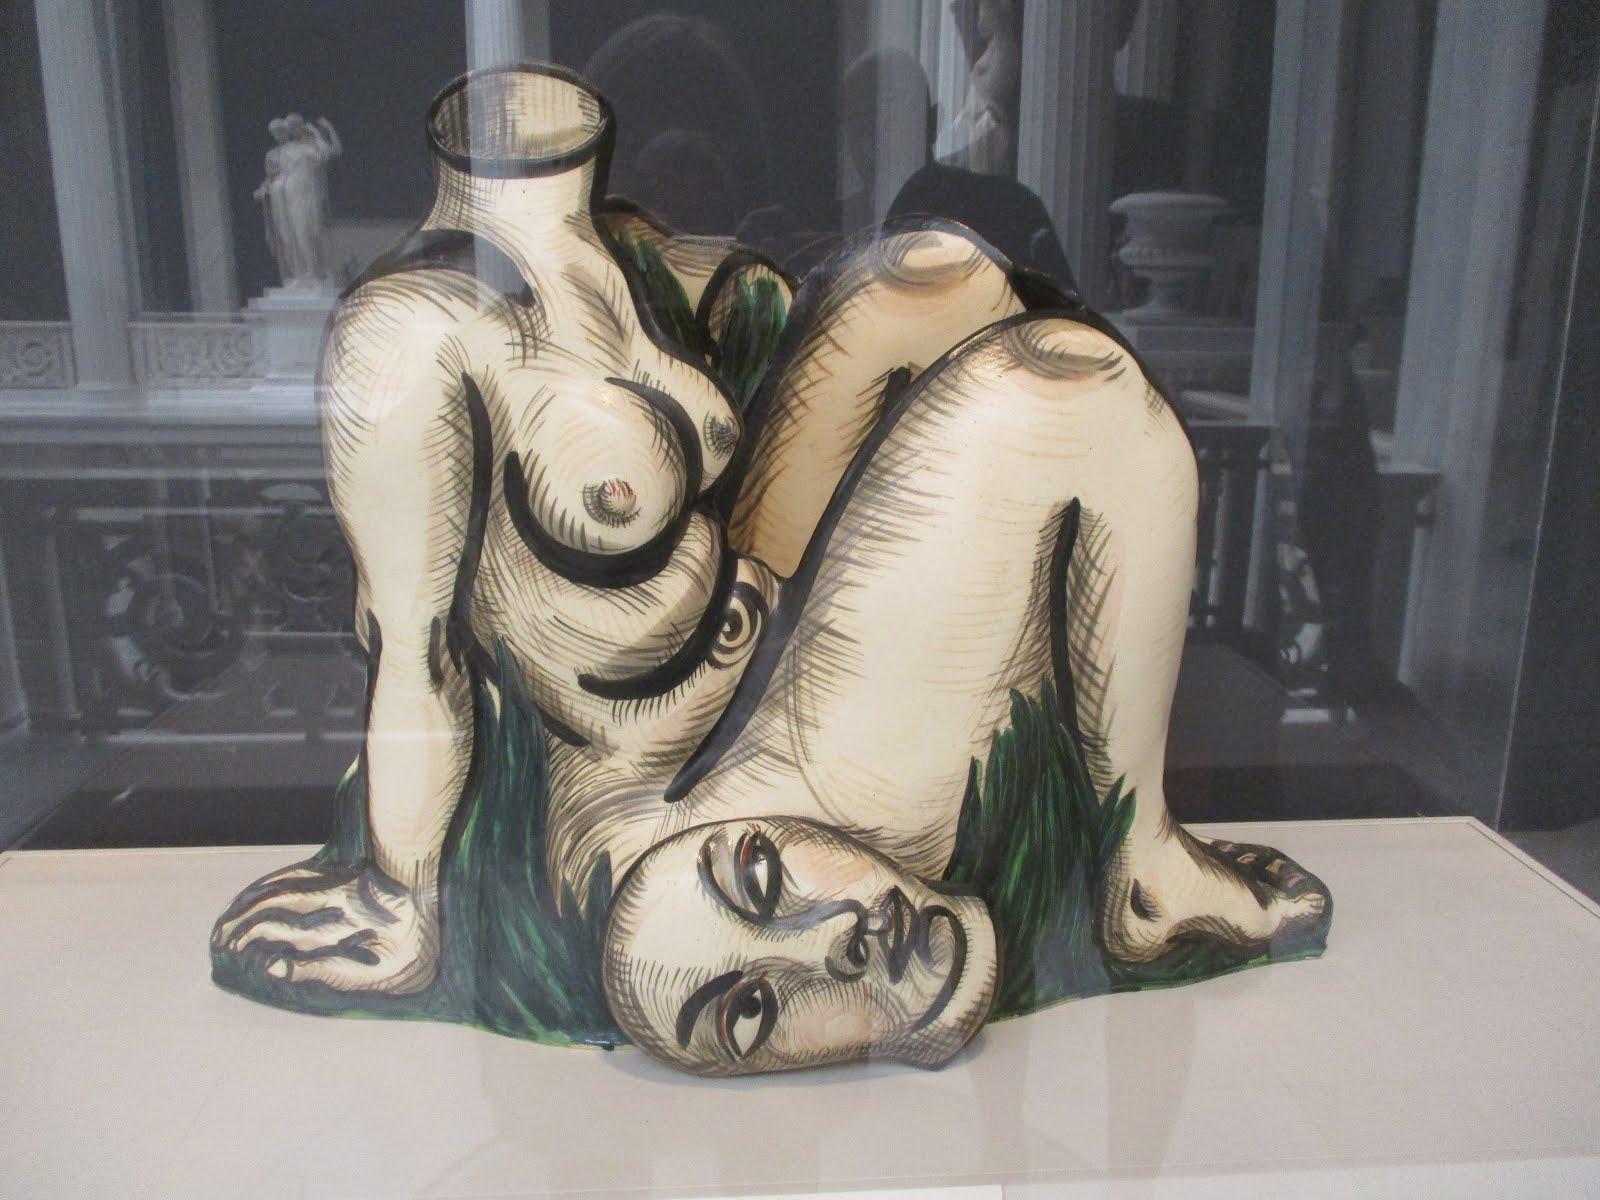 CARNEGIE MUSEUM OF ART PITTSBURG